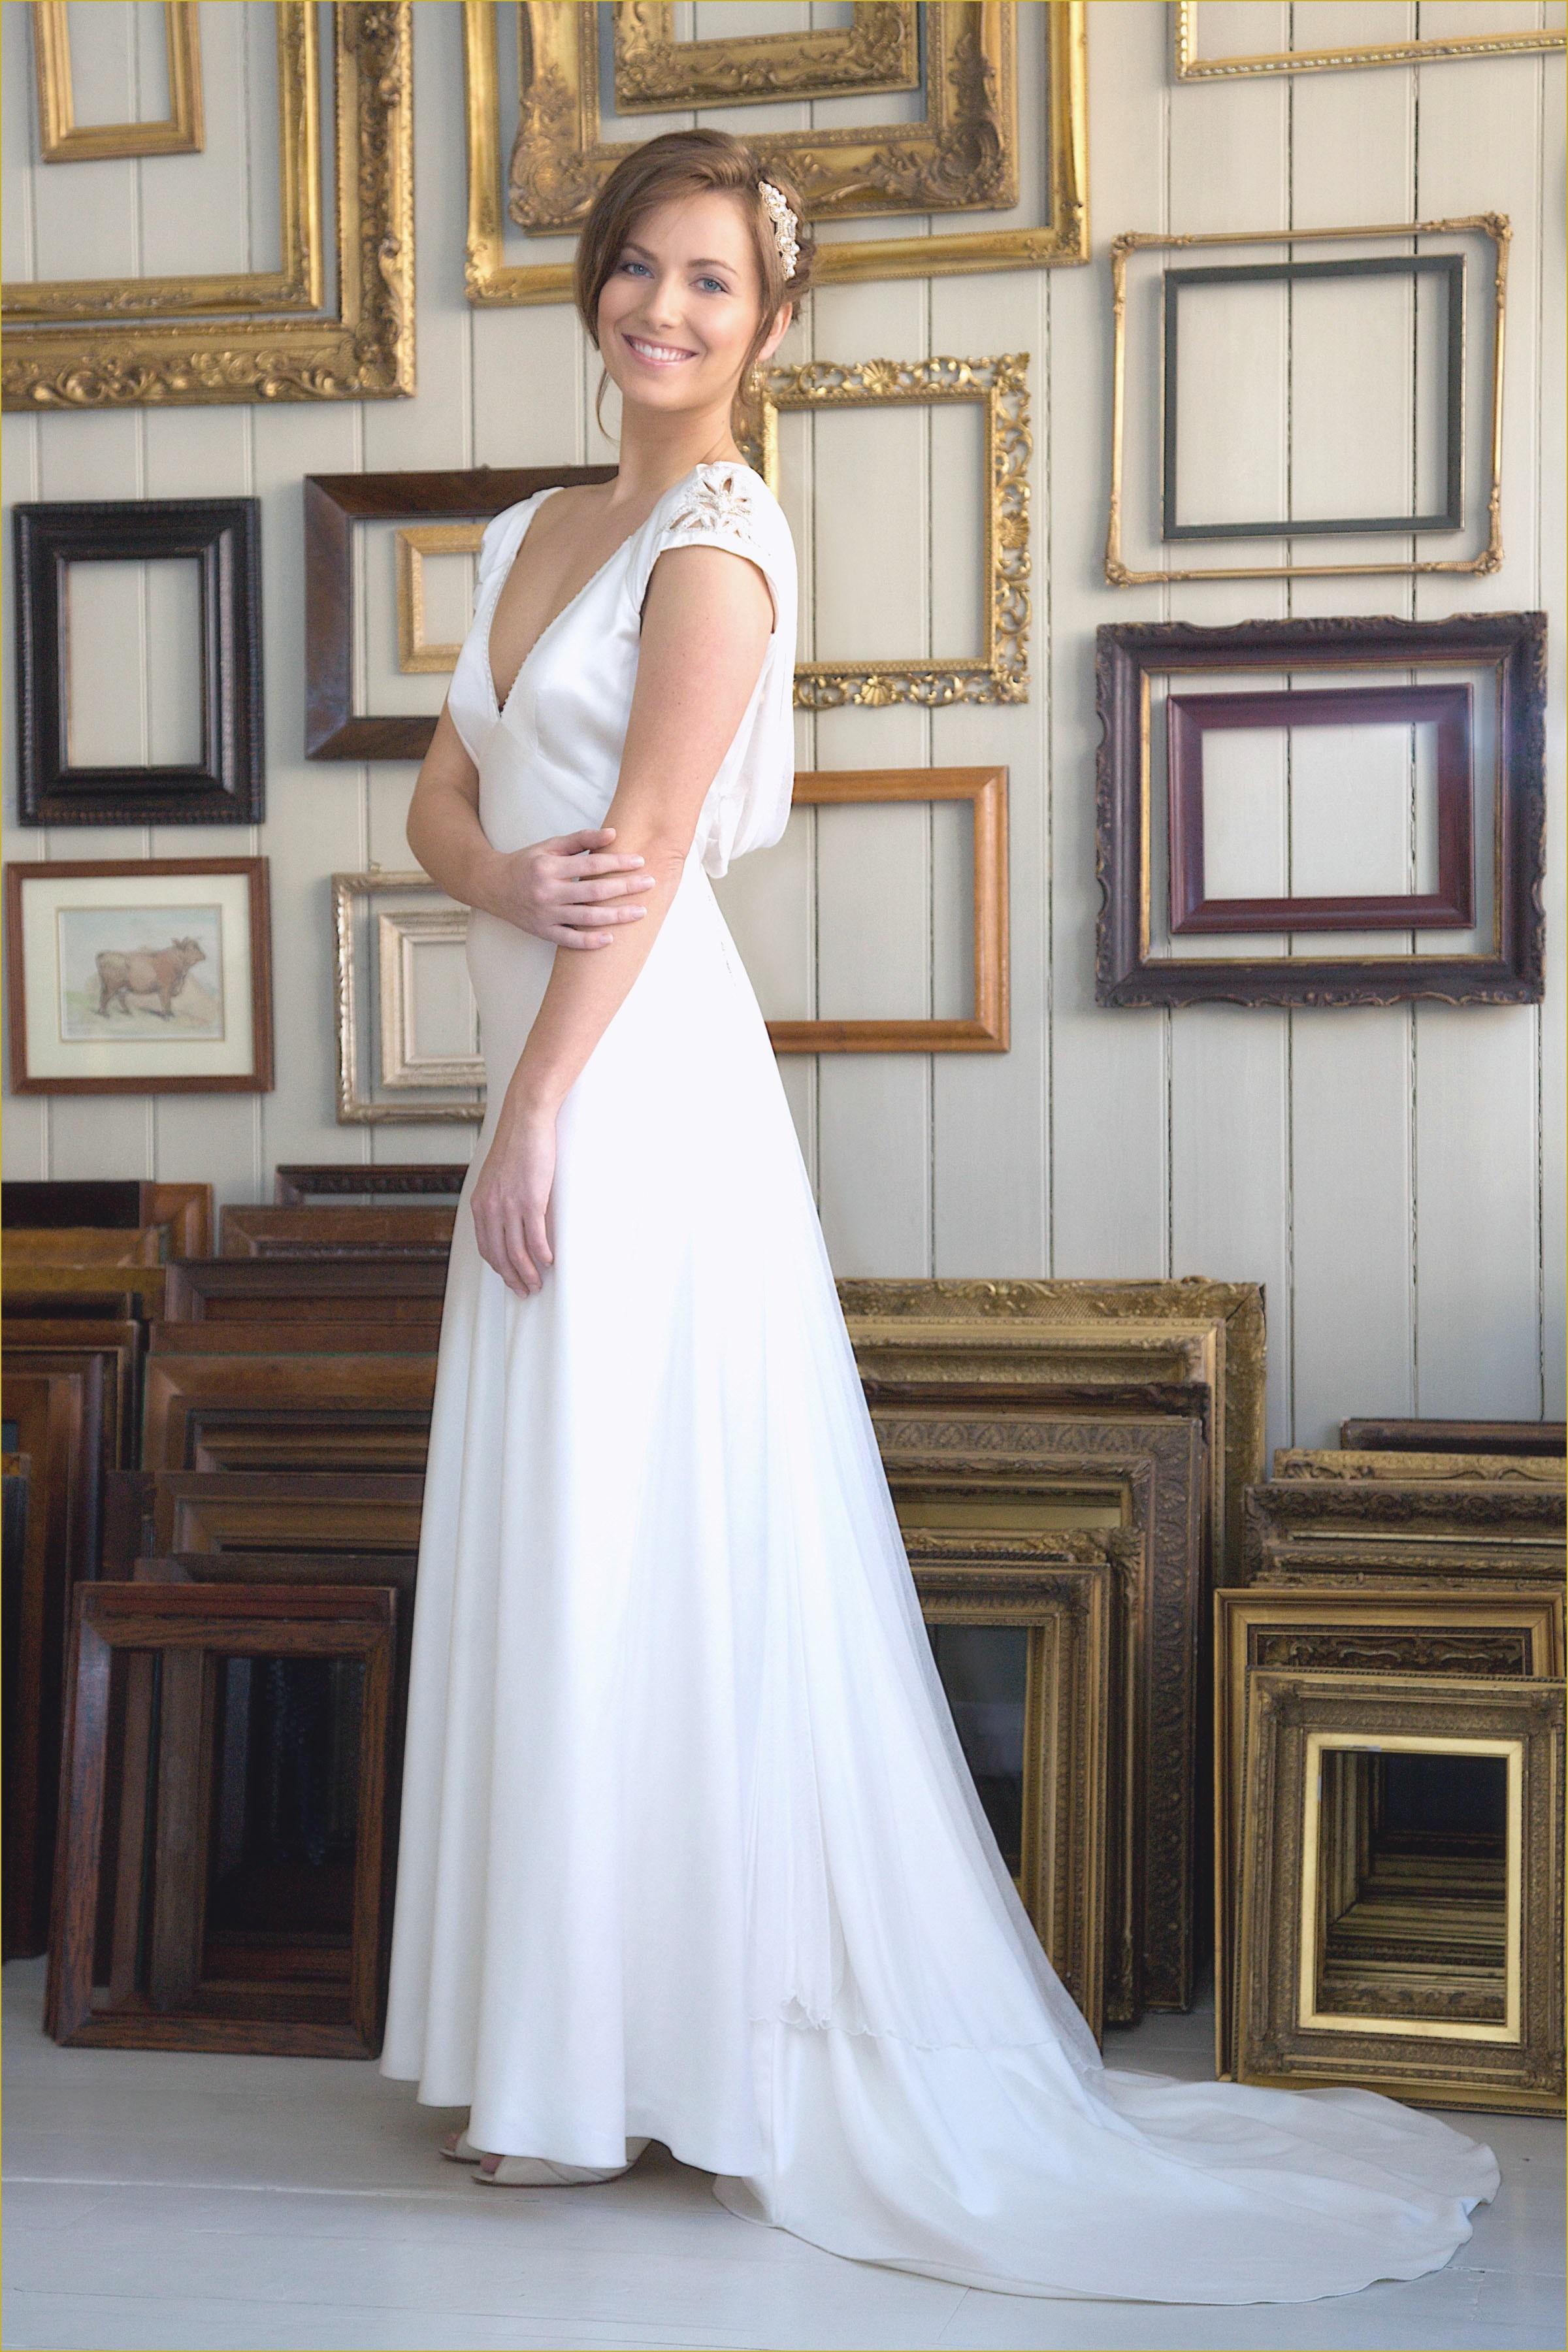 utah wedding dresses rental photo - 1